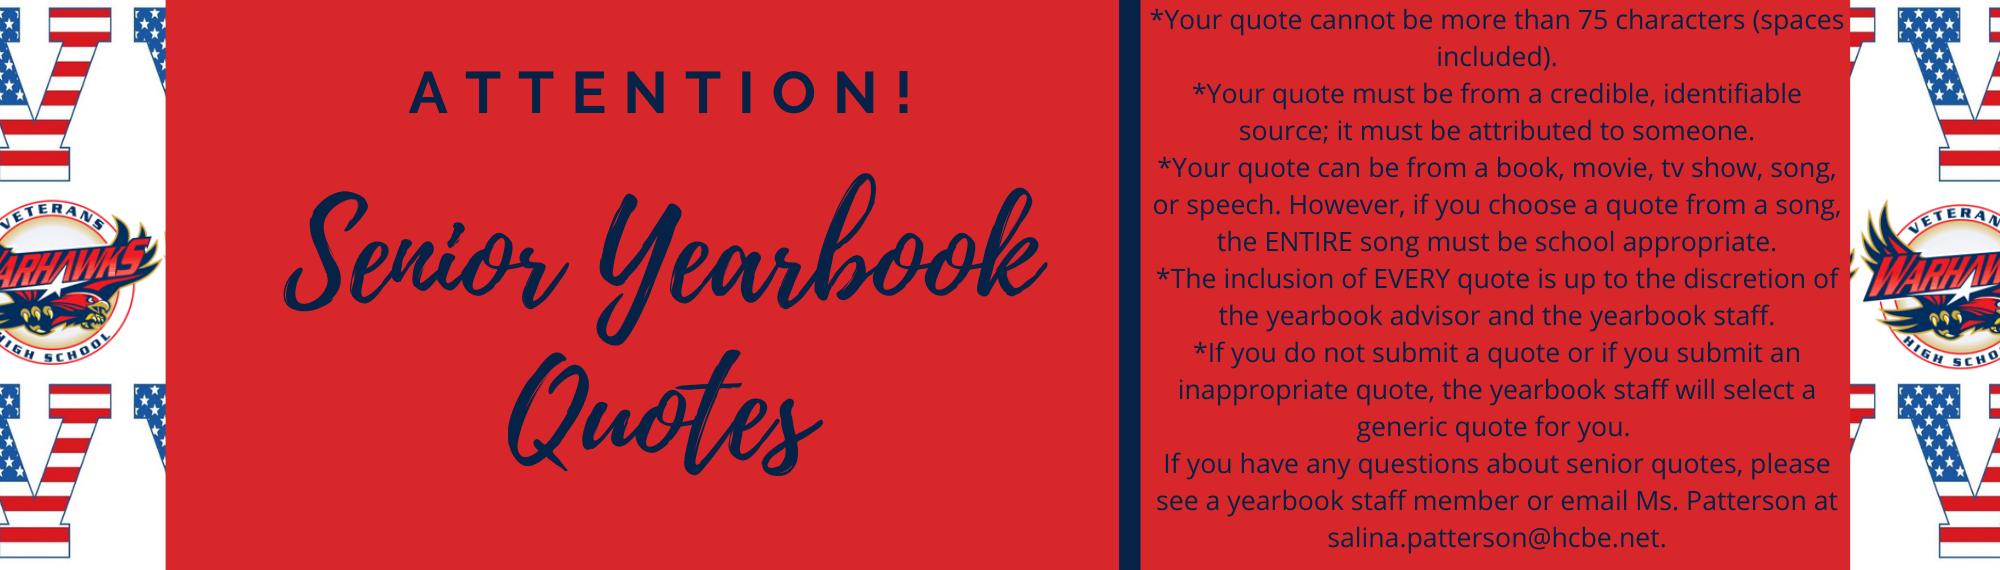 Senior Yearbook Quotes are due